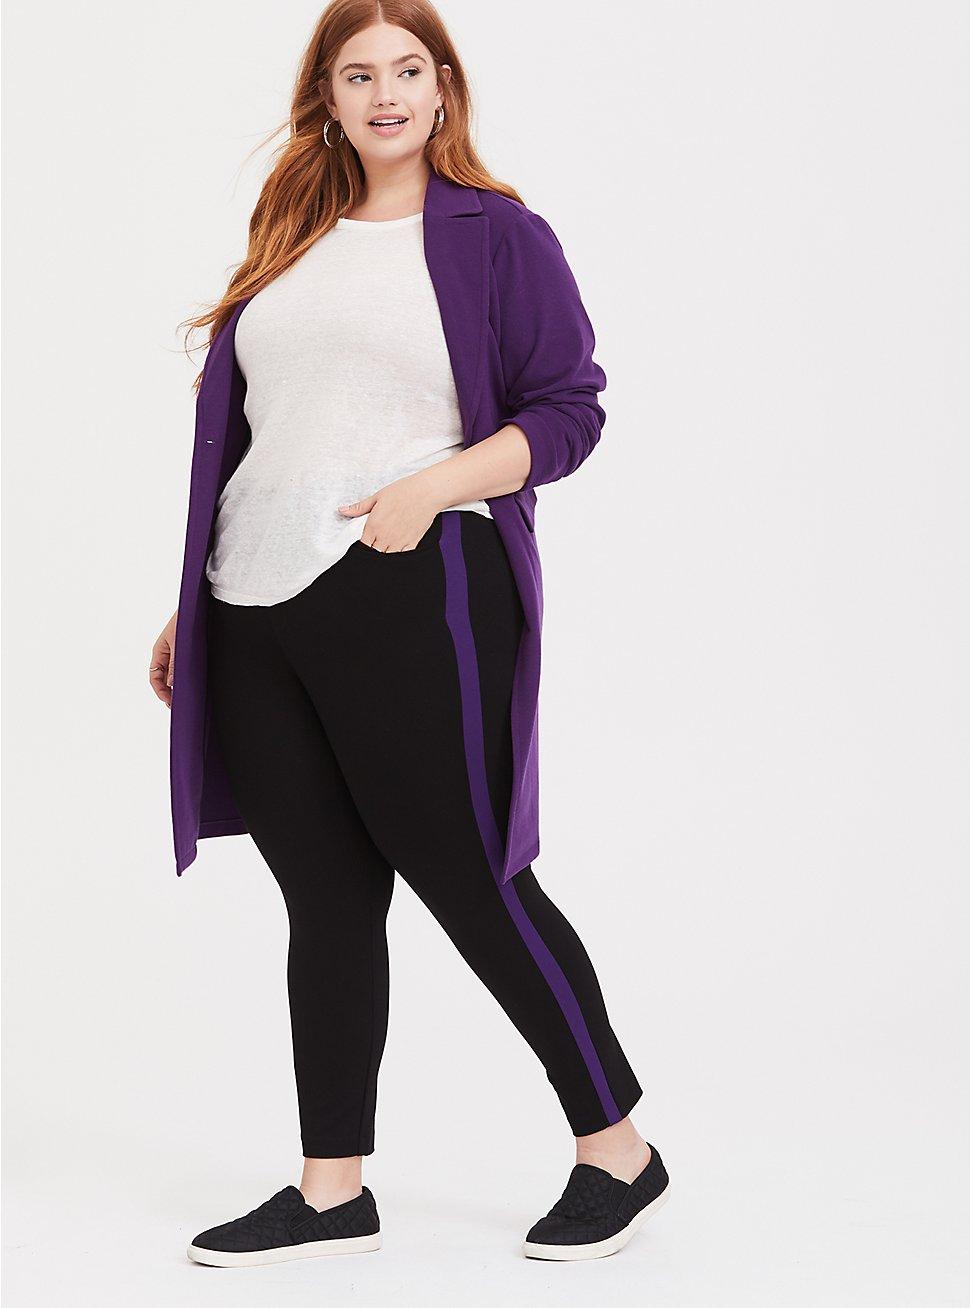 Premium Ponte Pull-On Sky High Trouser - Black with Purple Stripe, DEEP BLACK, hi-res